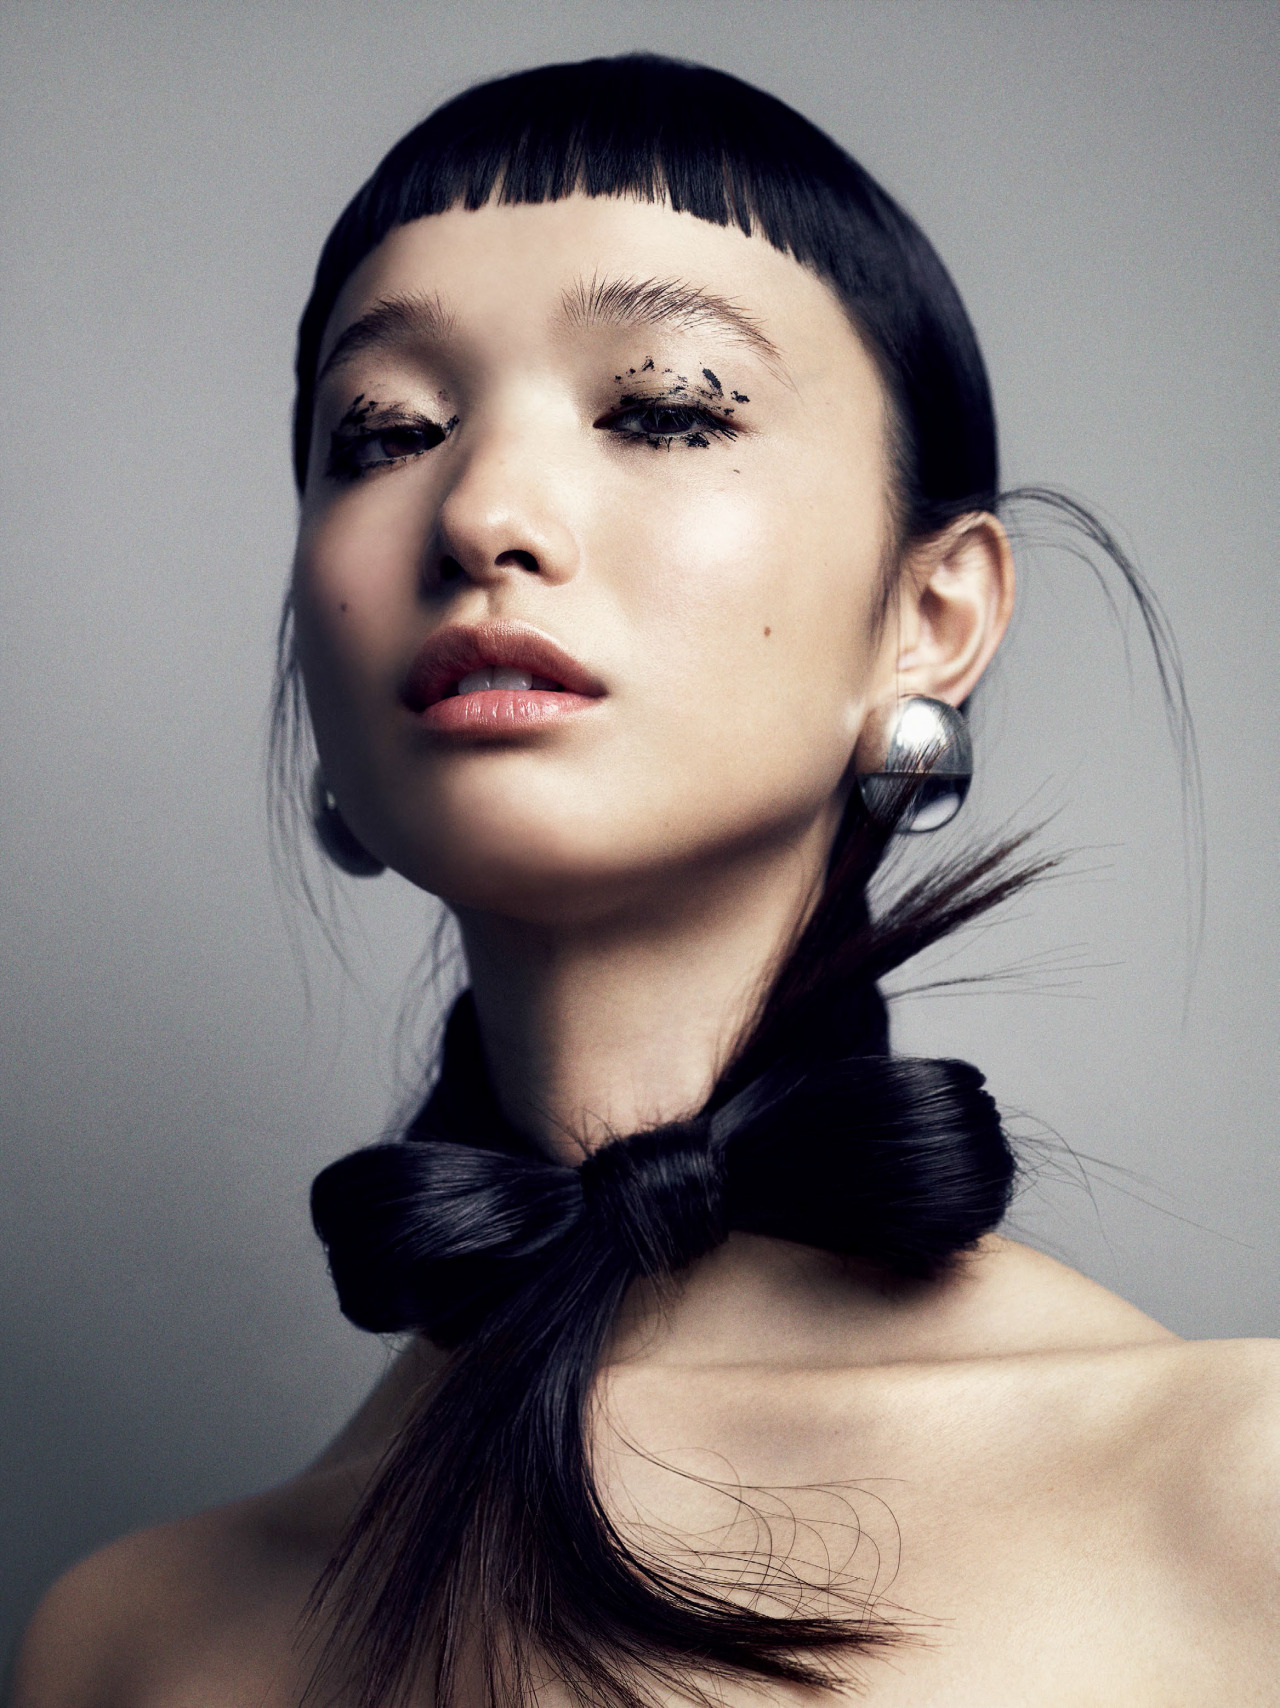 Chiharu Okunugi, Fernanda Ly, Shu Pei Qin, Soo Joo Park, Sora Choi, Milano Nasu & Yuka Mannami by Marcus Ohlsson  (4)